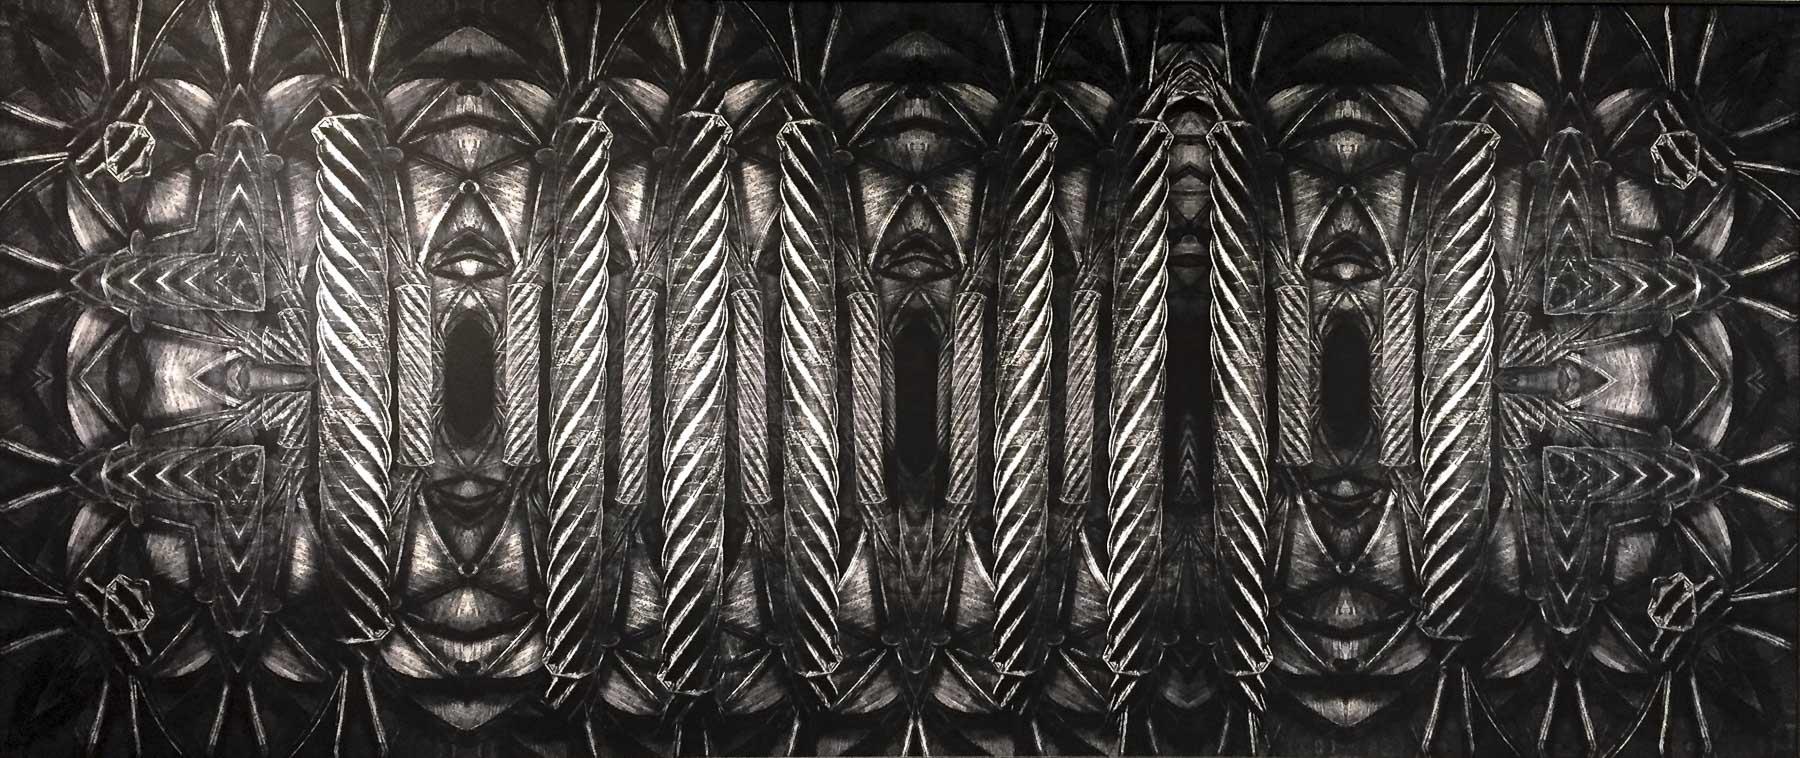 Galer a shiras galer a de arte valencia obras de arte - Galerias de arte en valencia ...